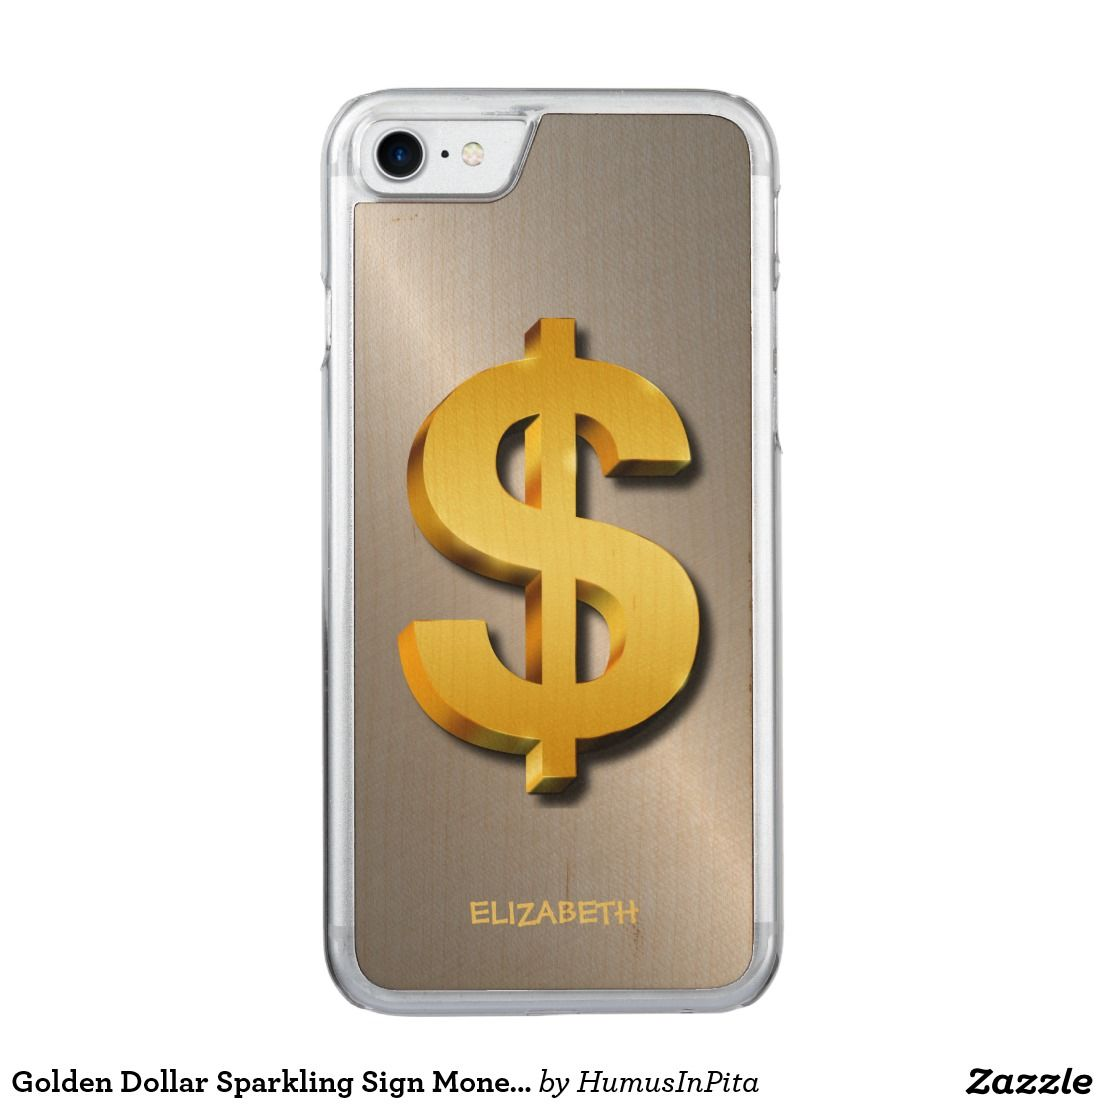 Golden dollar sparkling sign money symbol carved iphone 7 case golden dollar sparkling sign money symbol carved iphone 7 case biocorpaavc Gallery